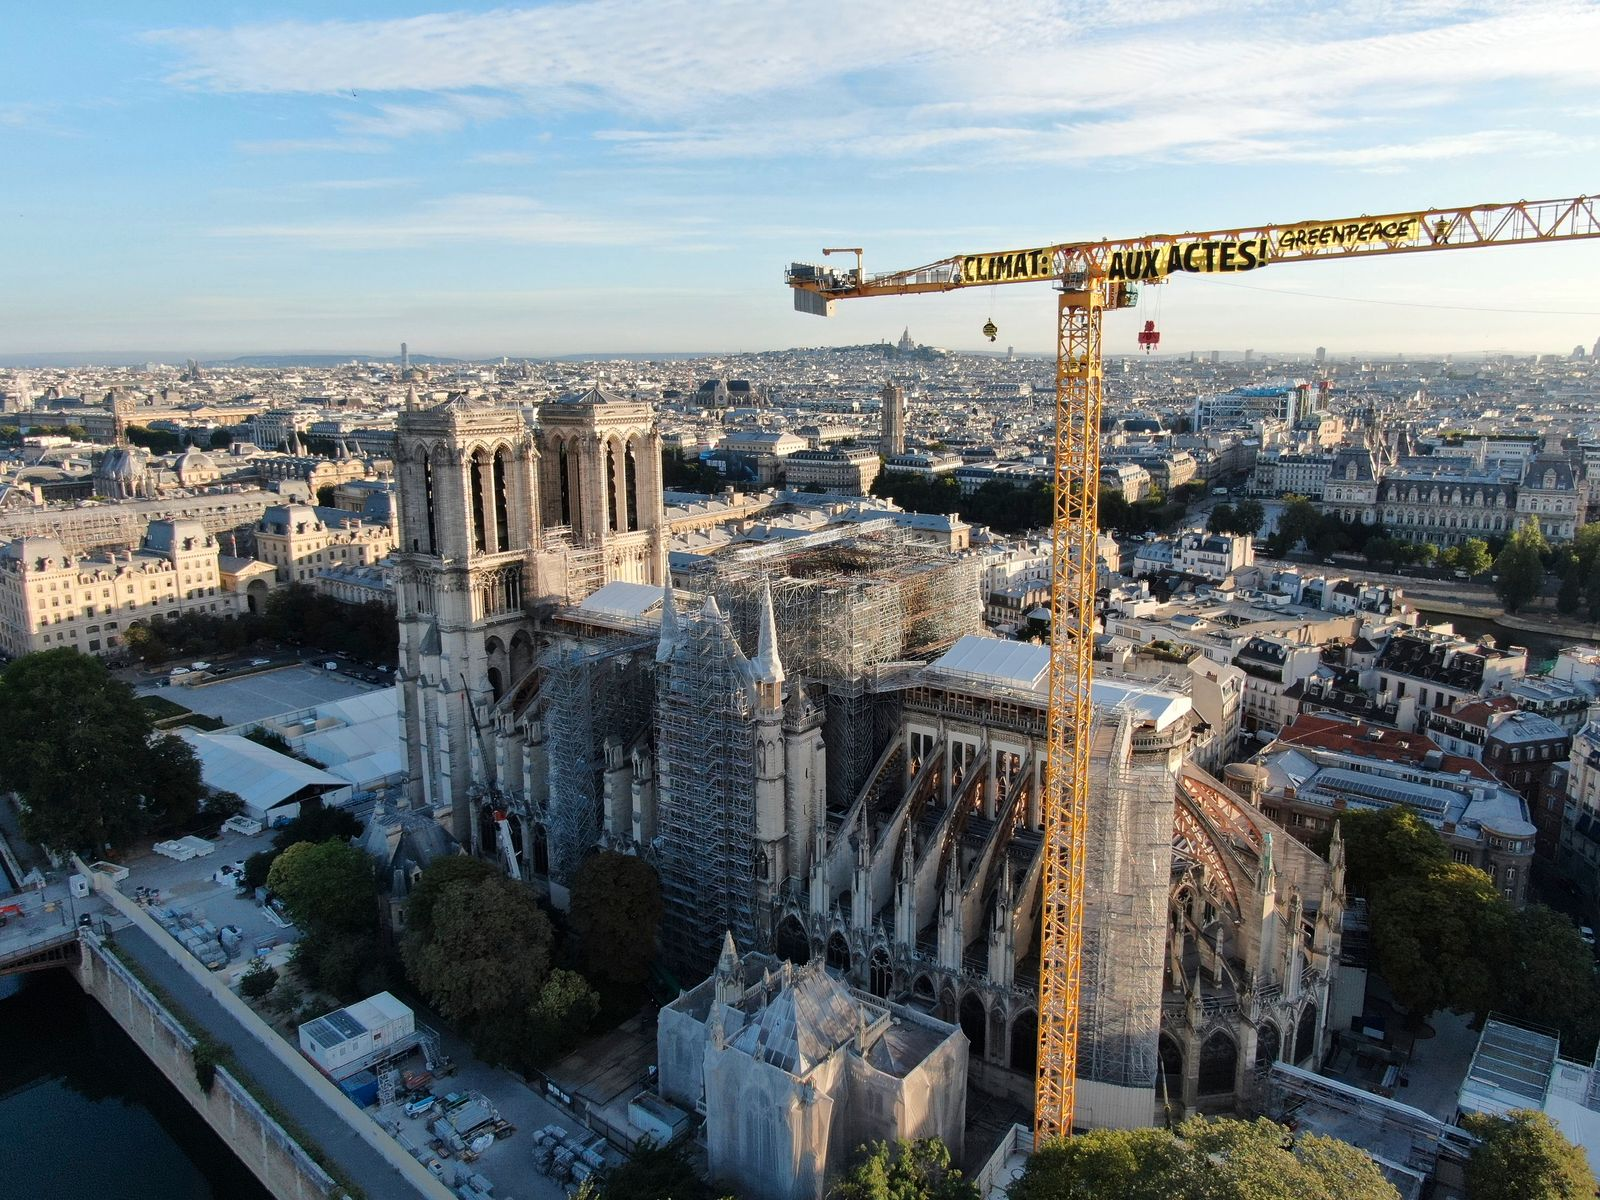 Greenpeace-Aktivisten klettern auf Kran am Notre-Dame